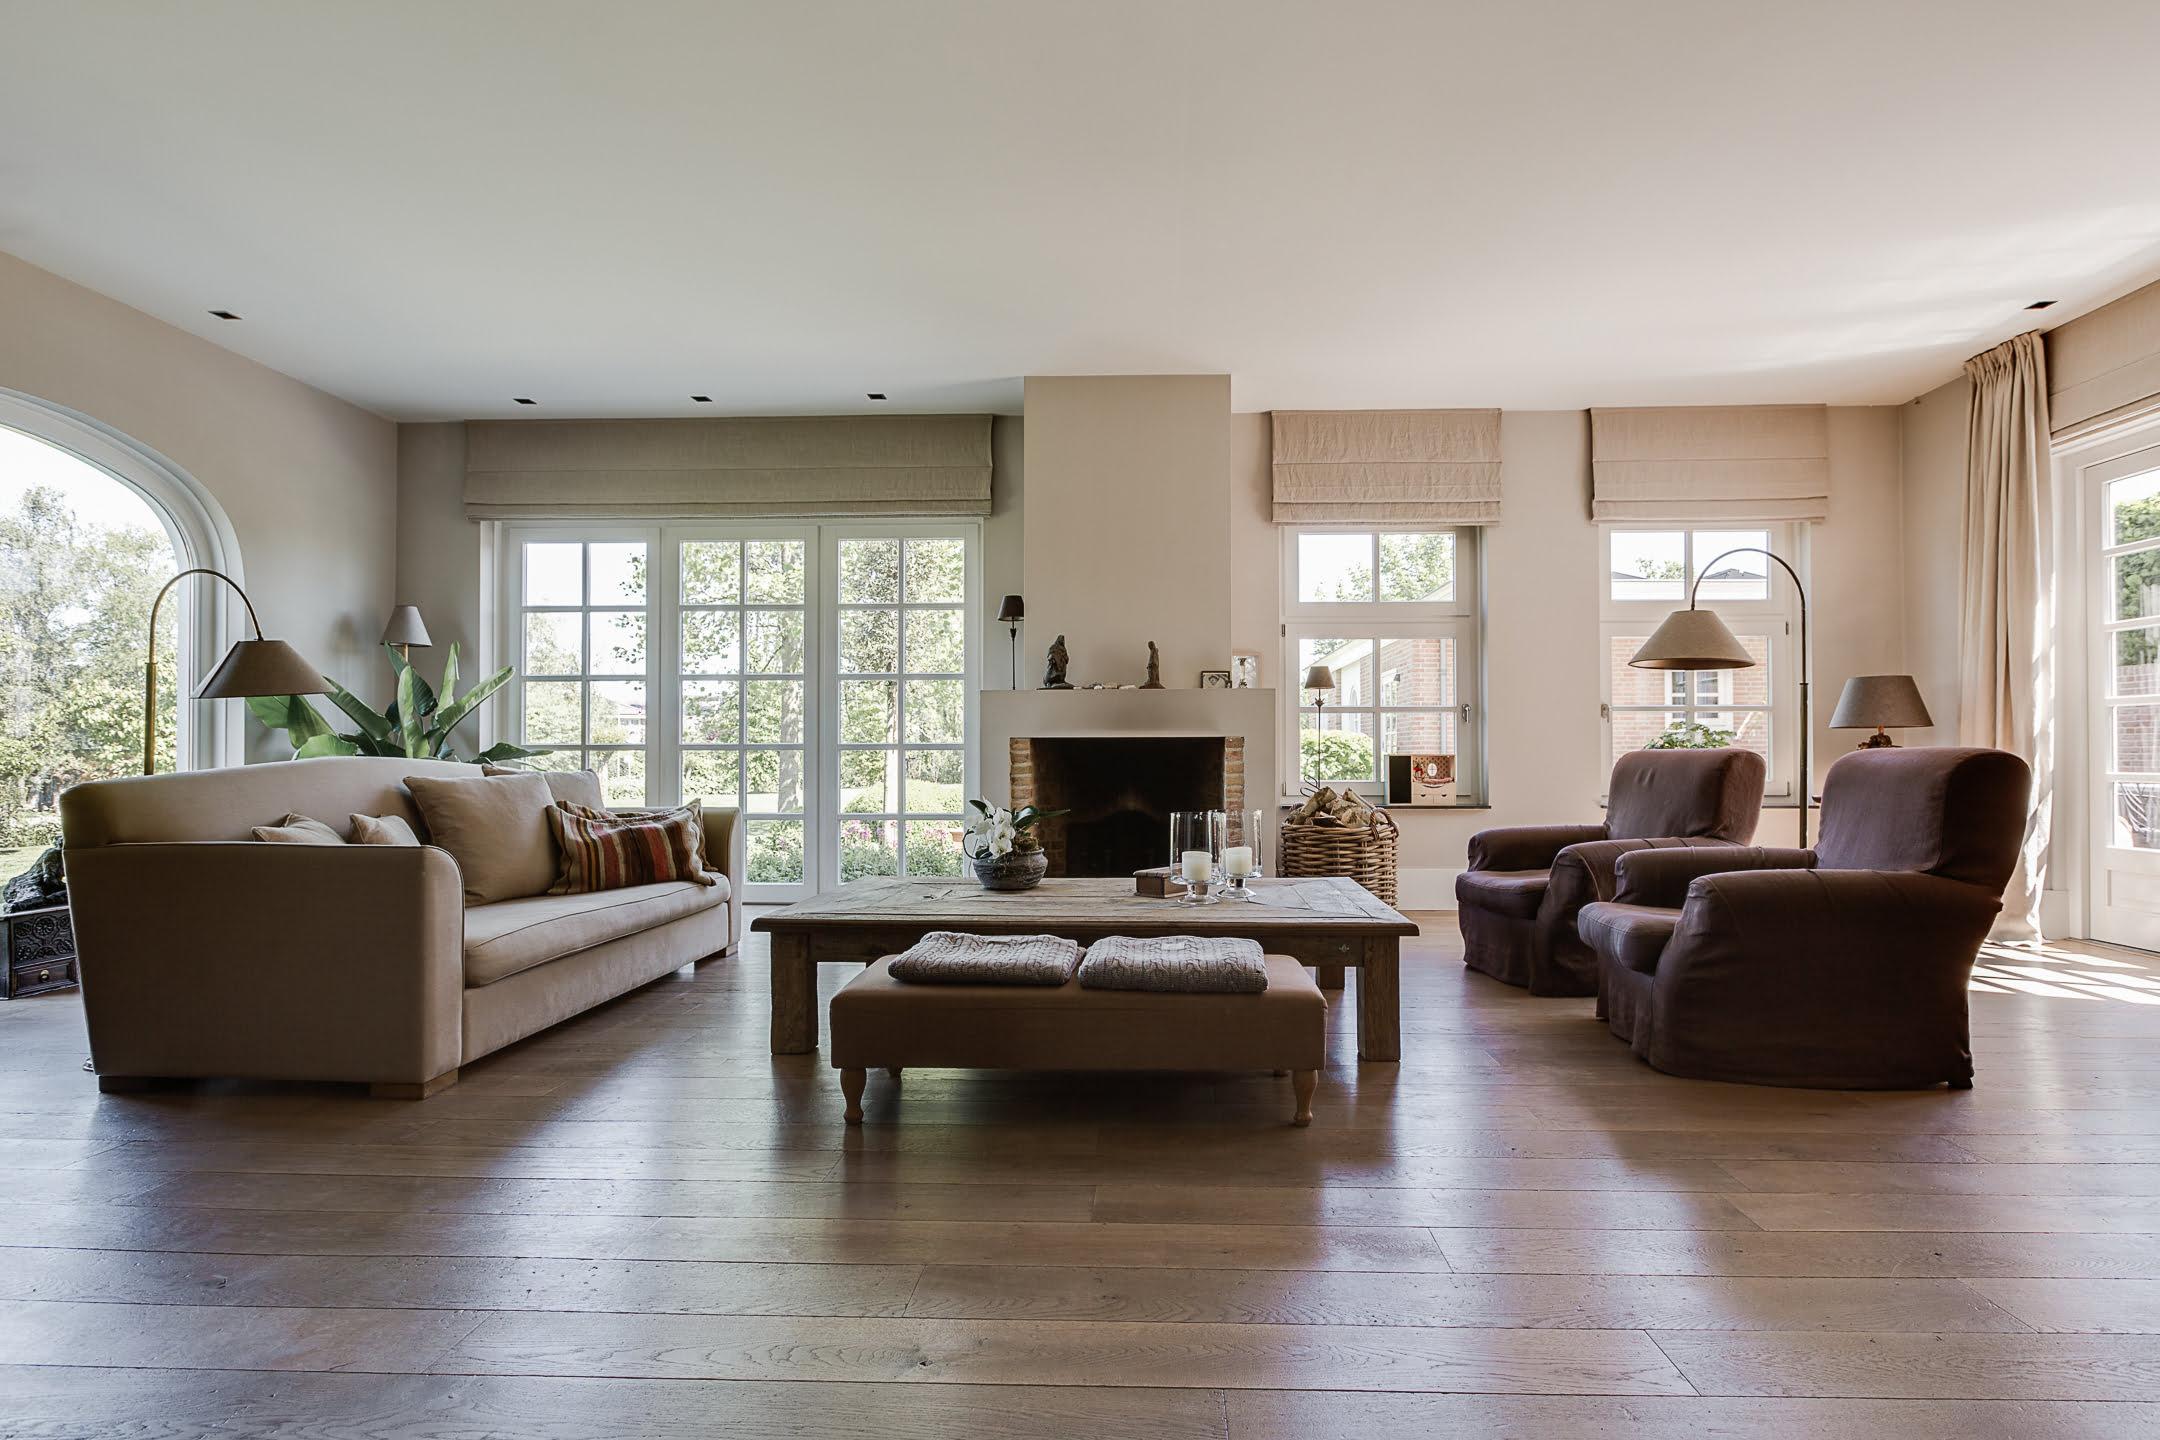 ruime woonkamer met veel lichtinval